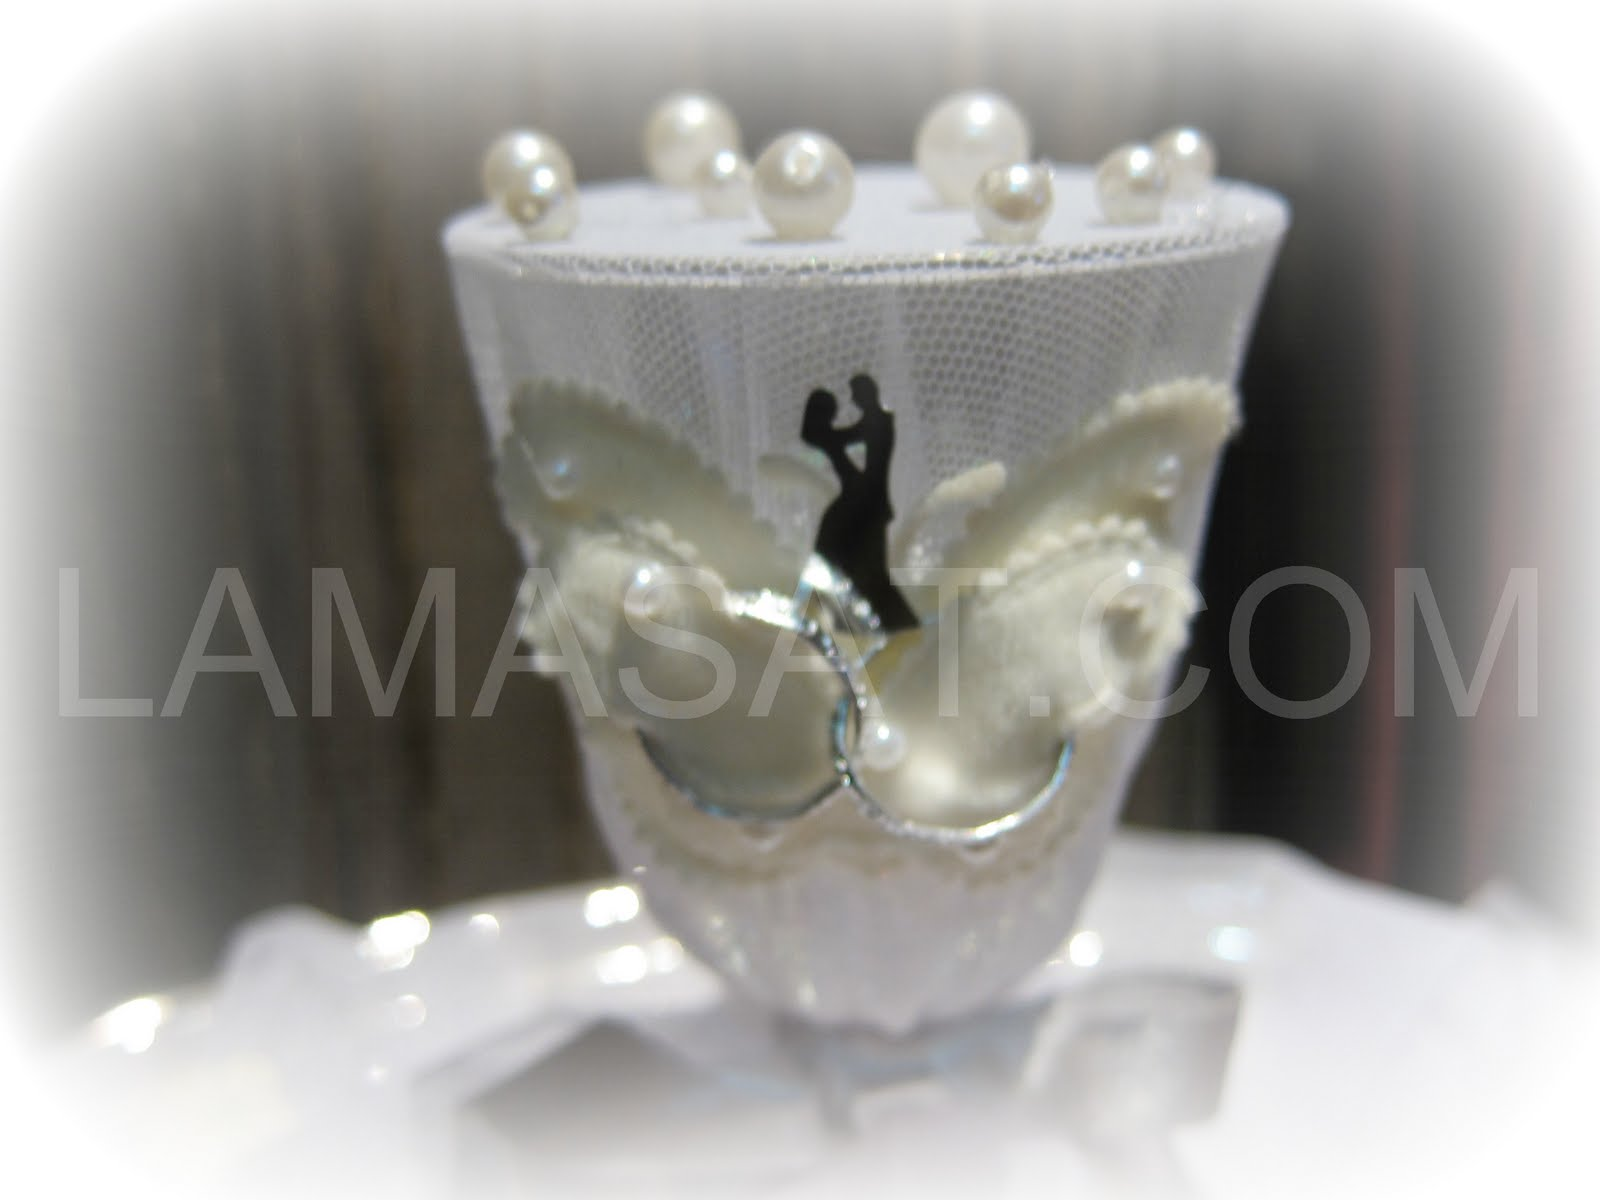 lamasat wedding bonbonnieres. Black Bedroom Furniture Sets. Home Design Ideas